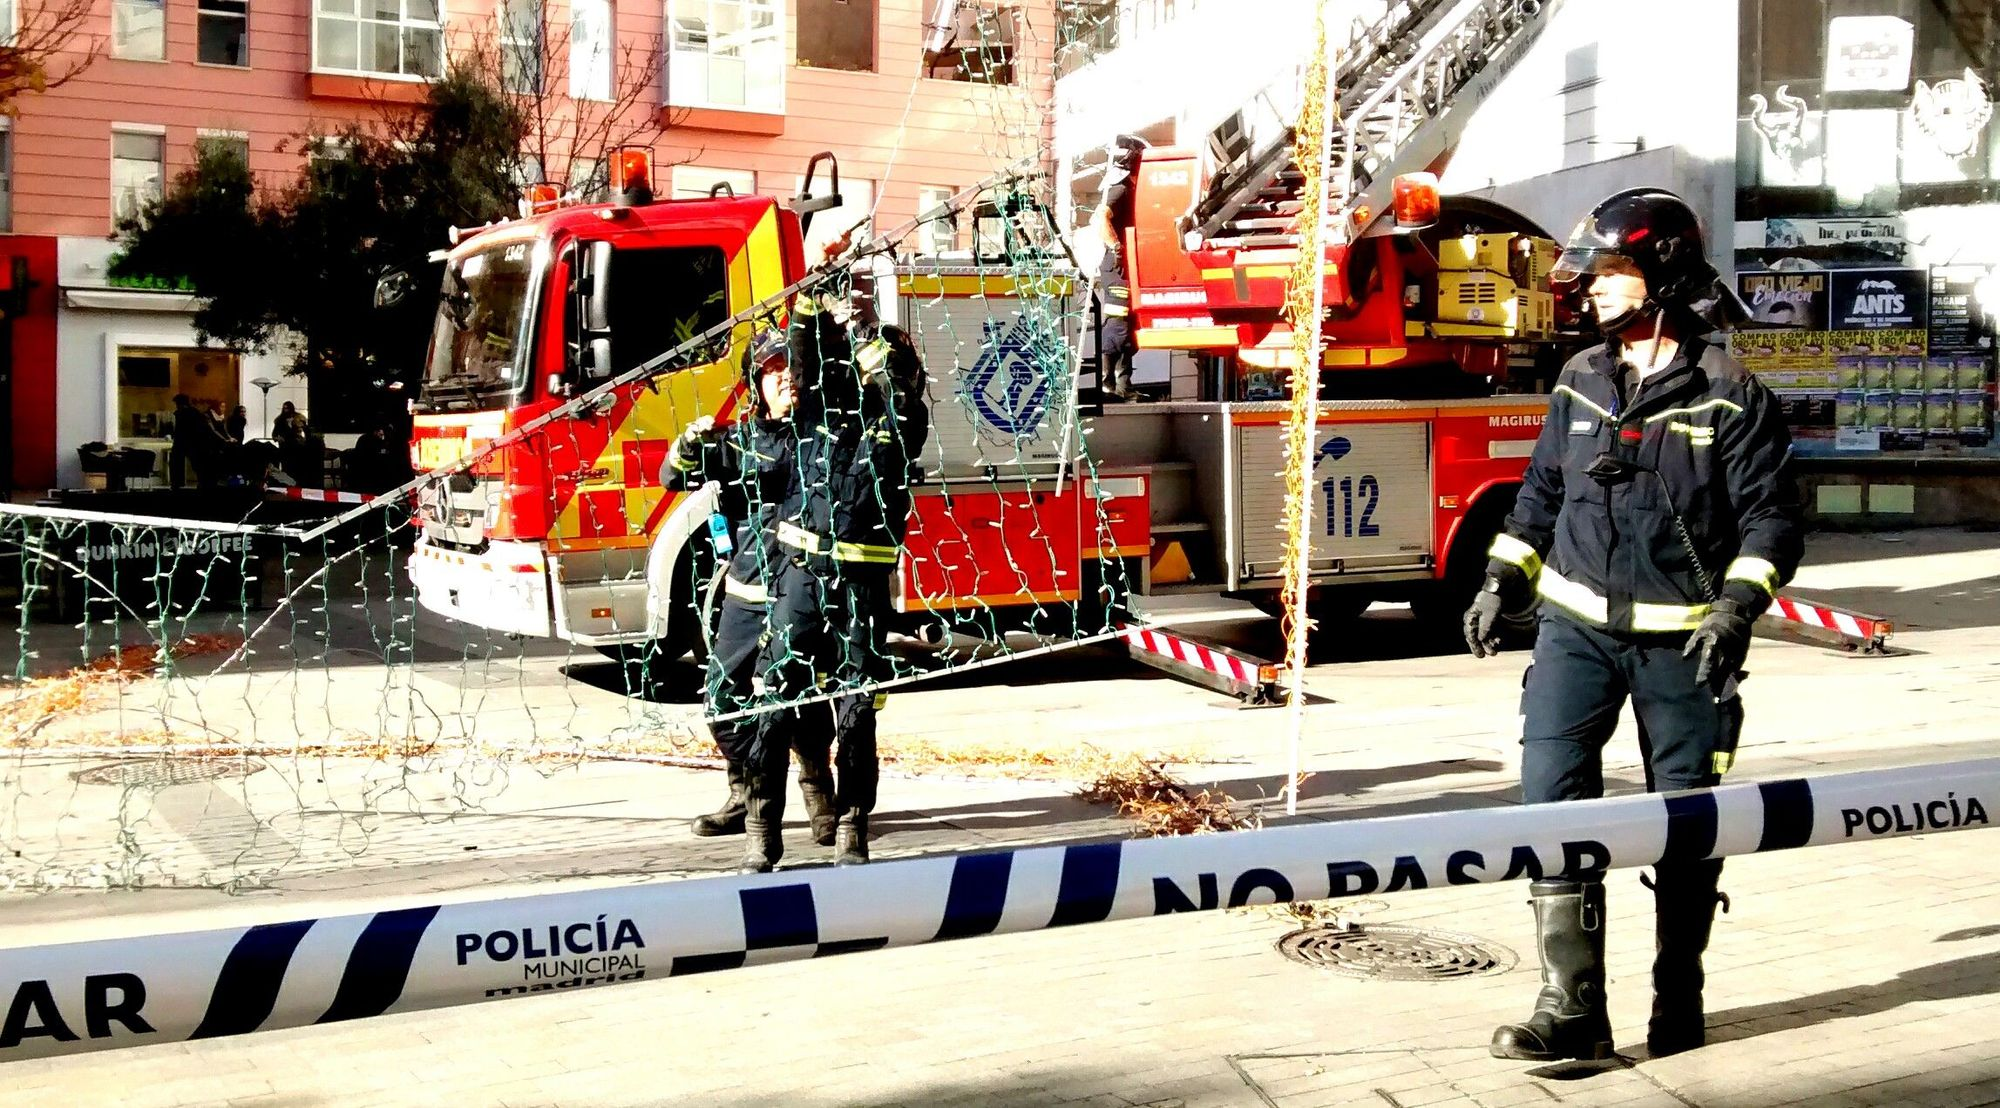 Bomberos descolgando el alumbrado navideño de Fuencarral | FOTO: SOMOS MALASAÑA